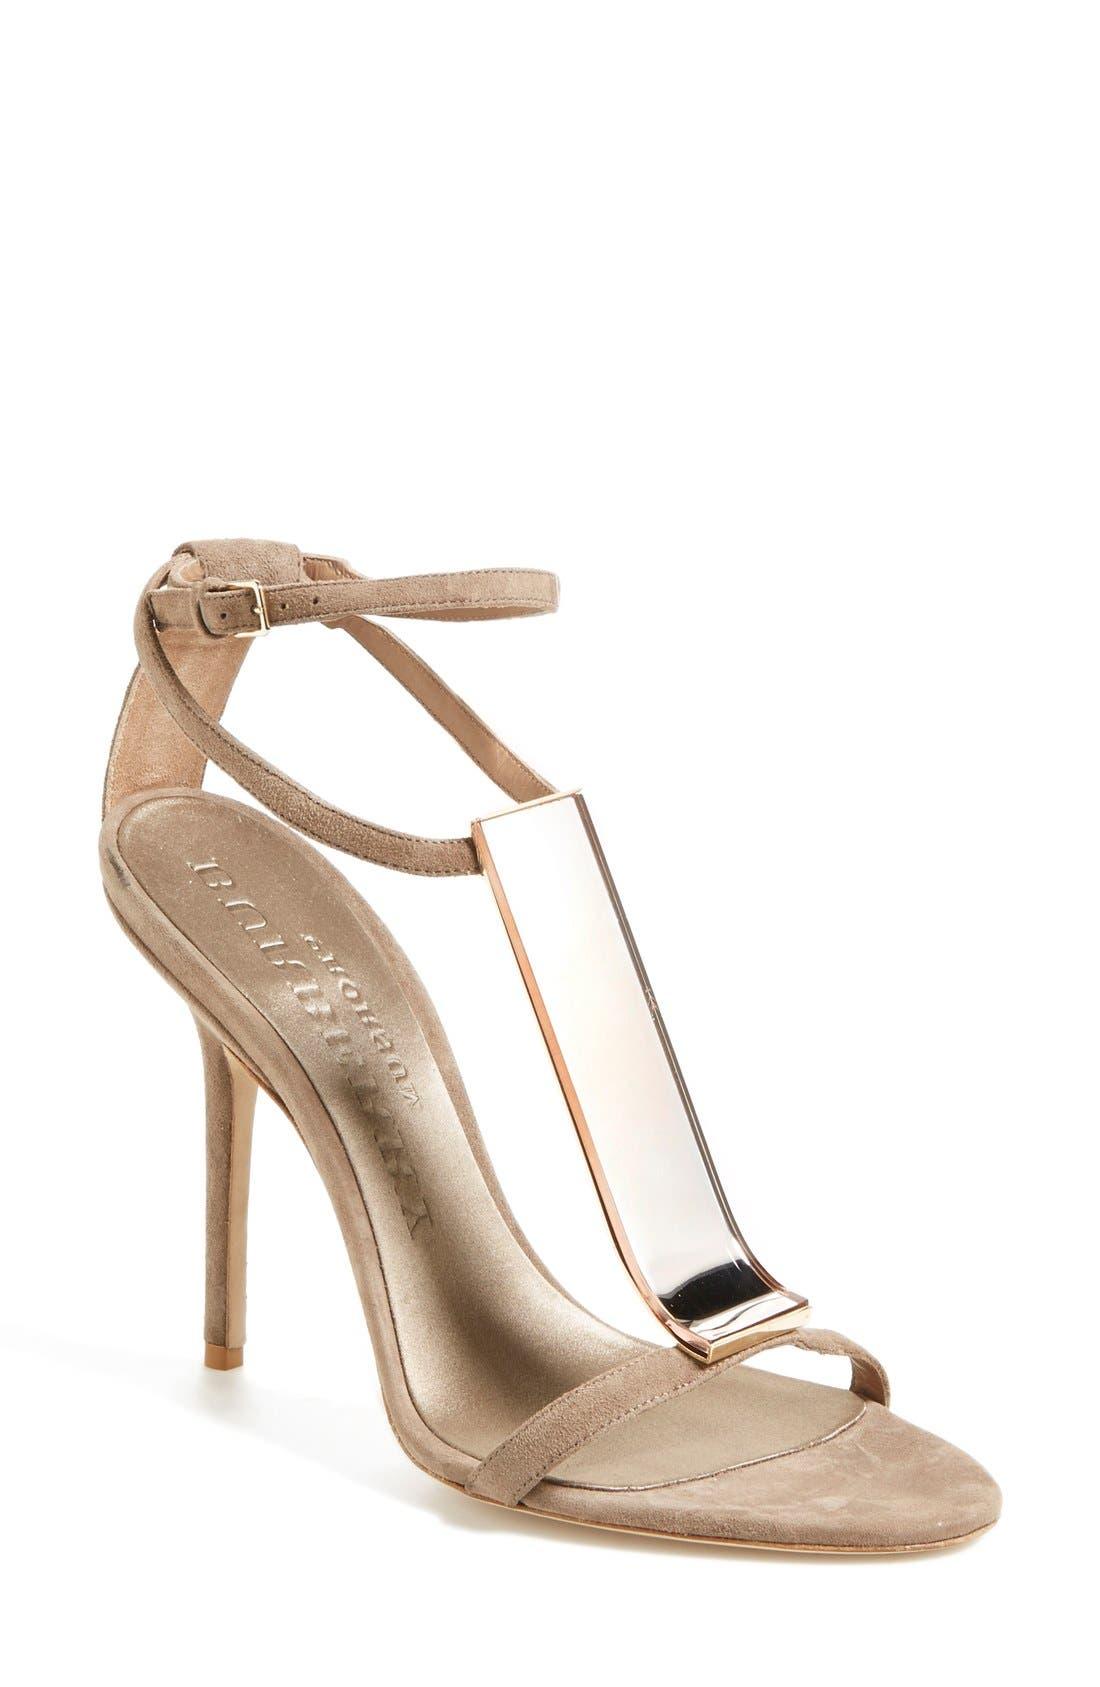 Alternate Image 1 Selected - Burberry 'Irving' Perspex® T-Bar Sandal (Women)